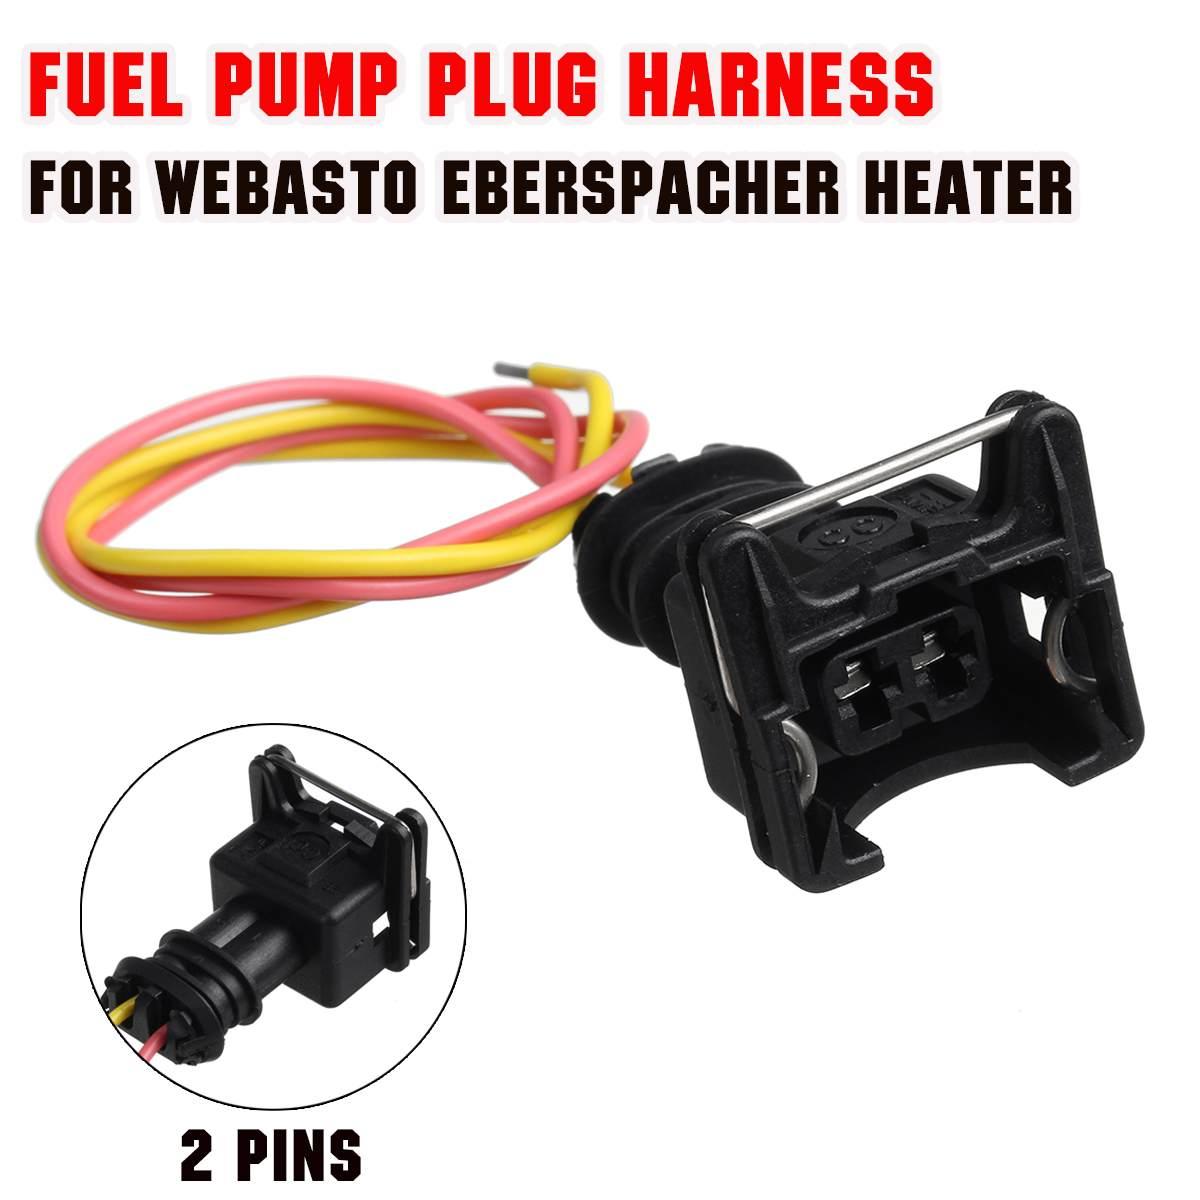 Car Heater Fuel Pump Plug Wire Harness Connector 2 Pin For Webasto Eberspacher Air Diesel Heater Accessories